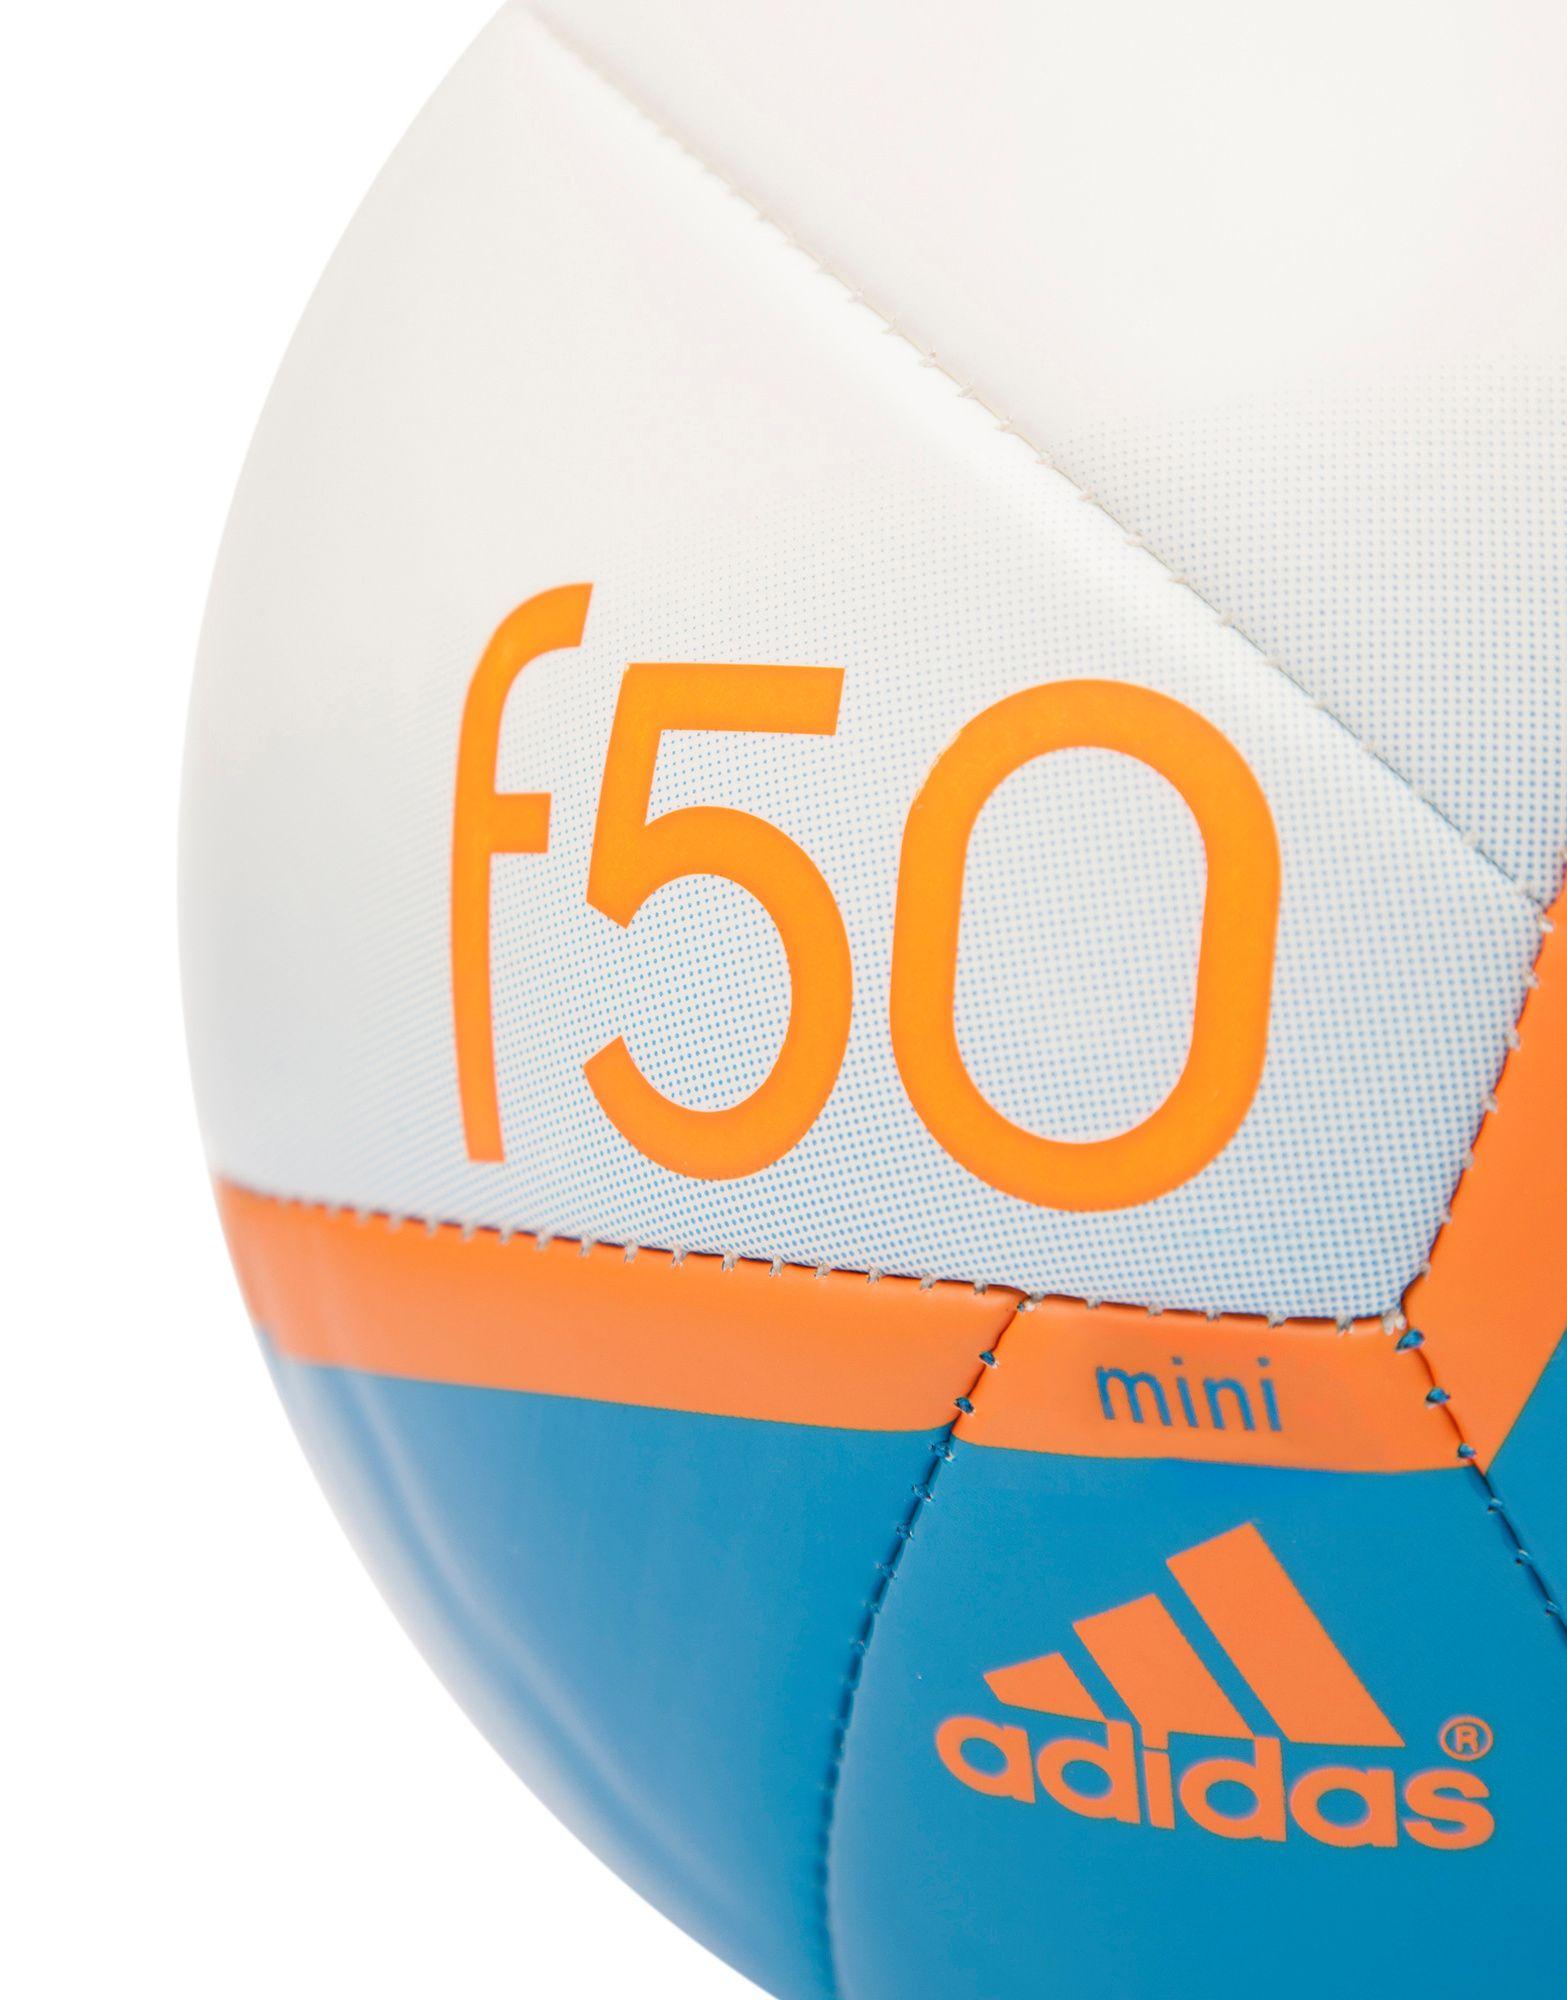 adidas F50 Mini Football